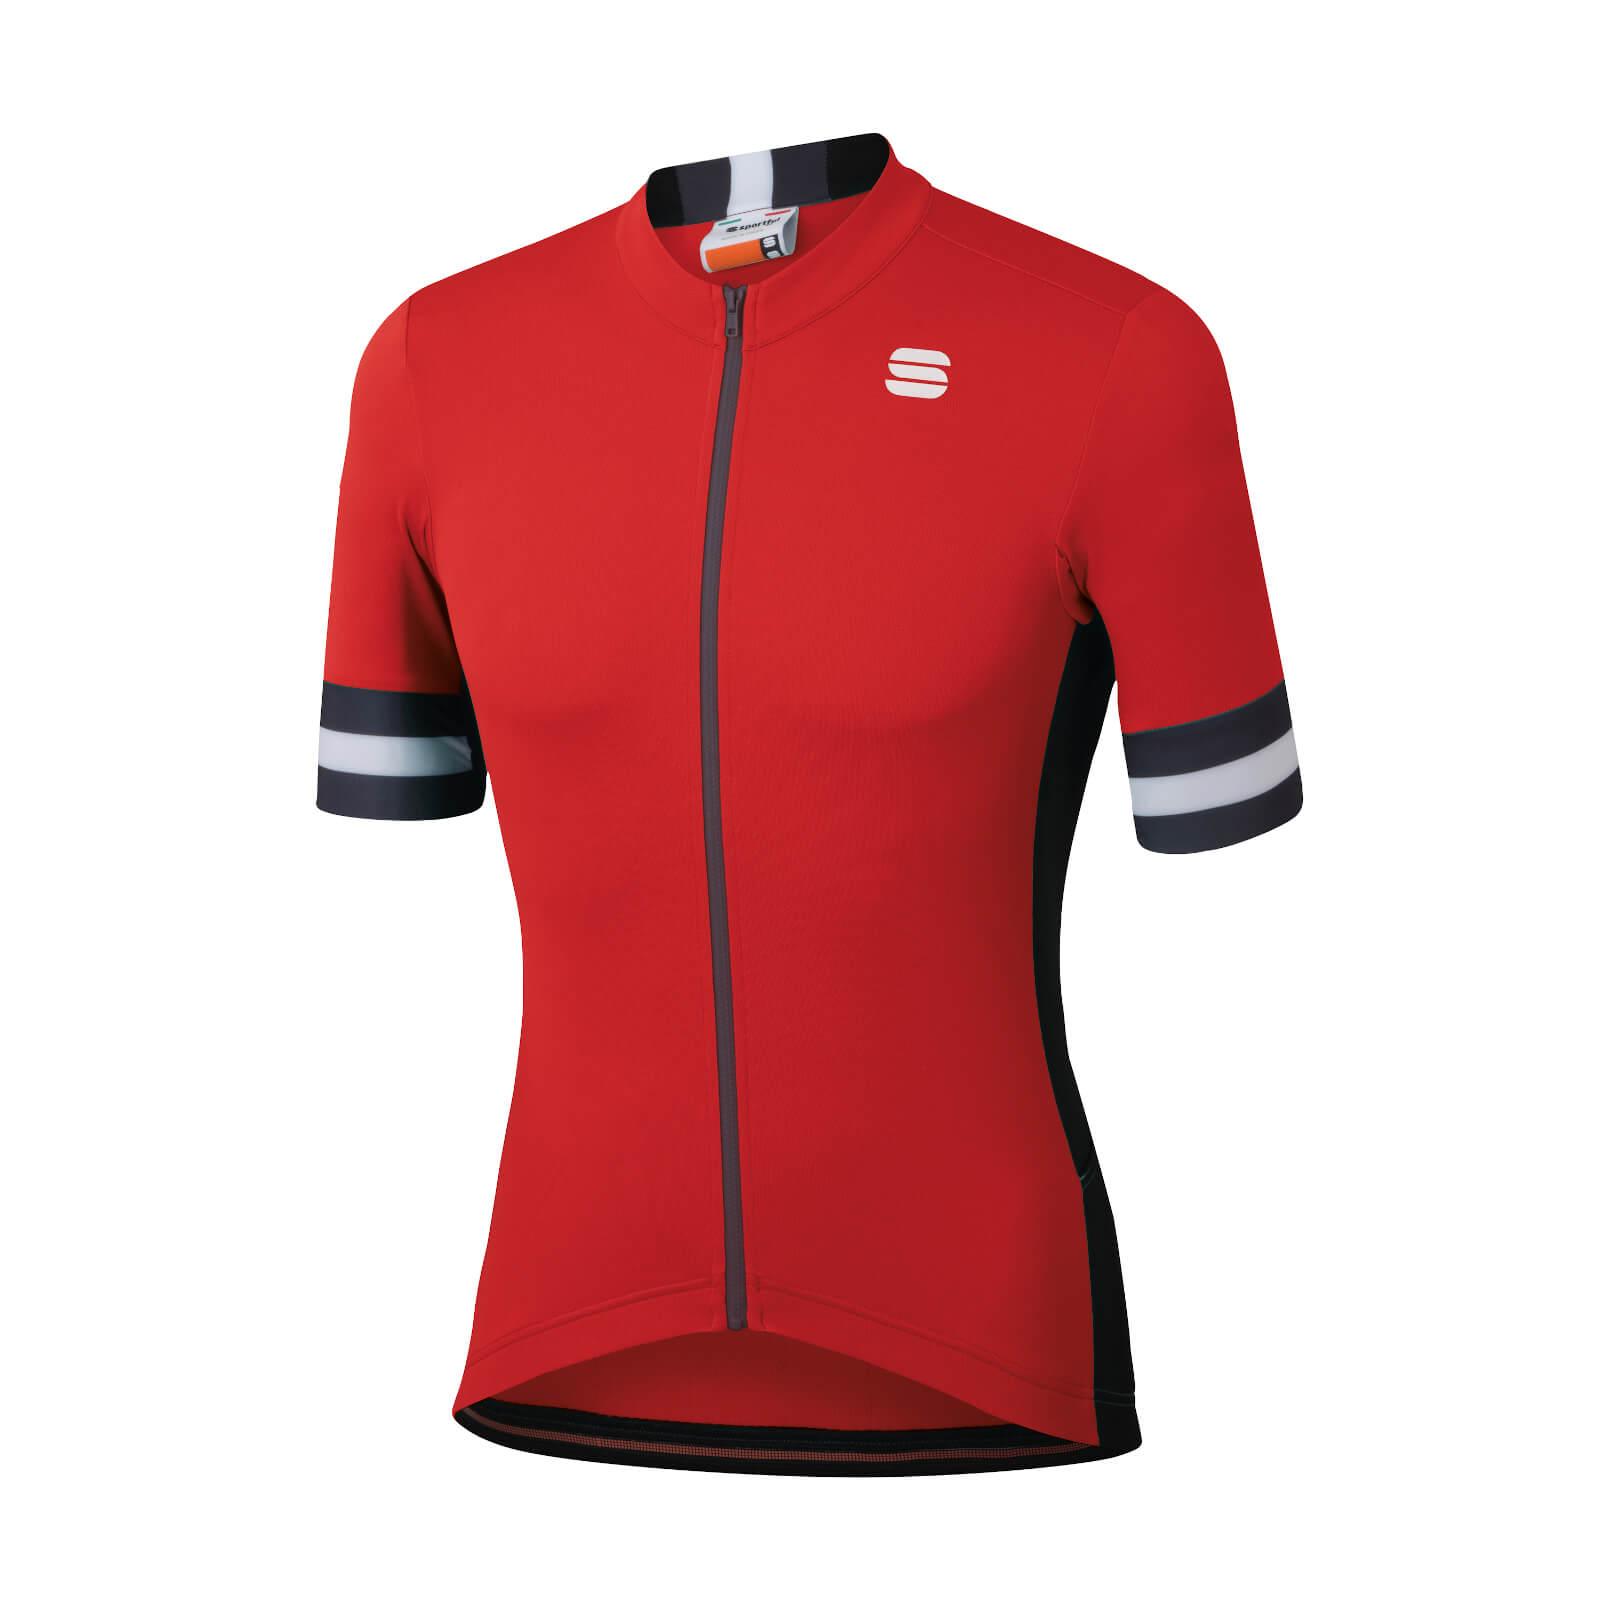 Sportful Kite Jersey - XL - Red